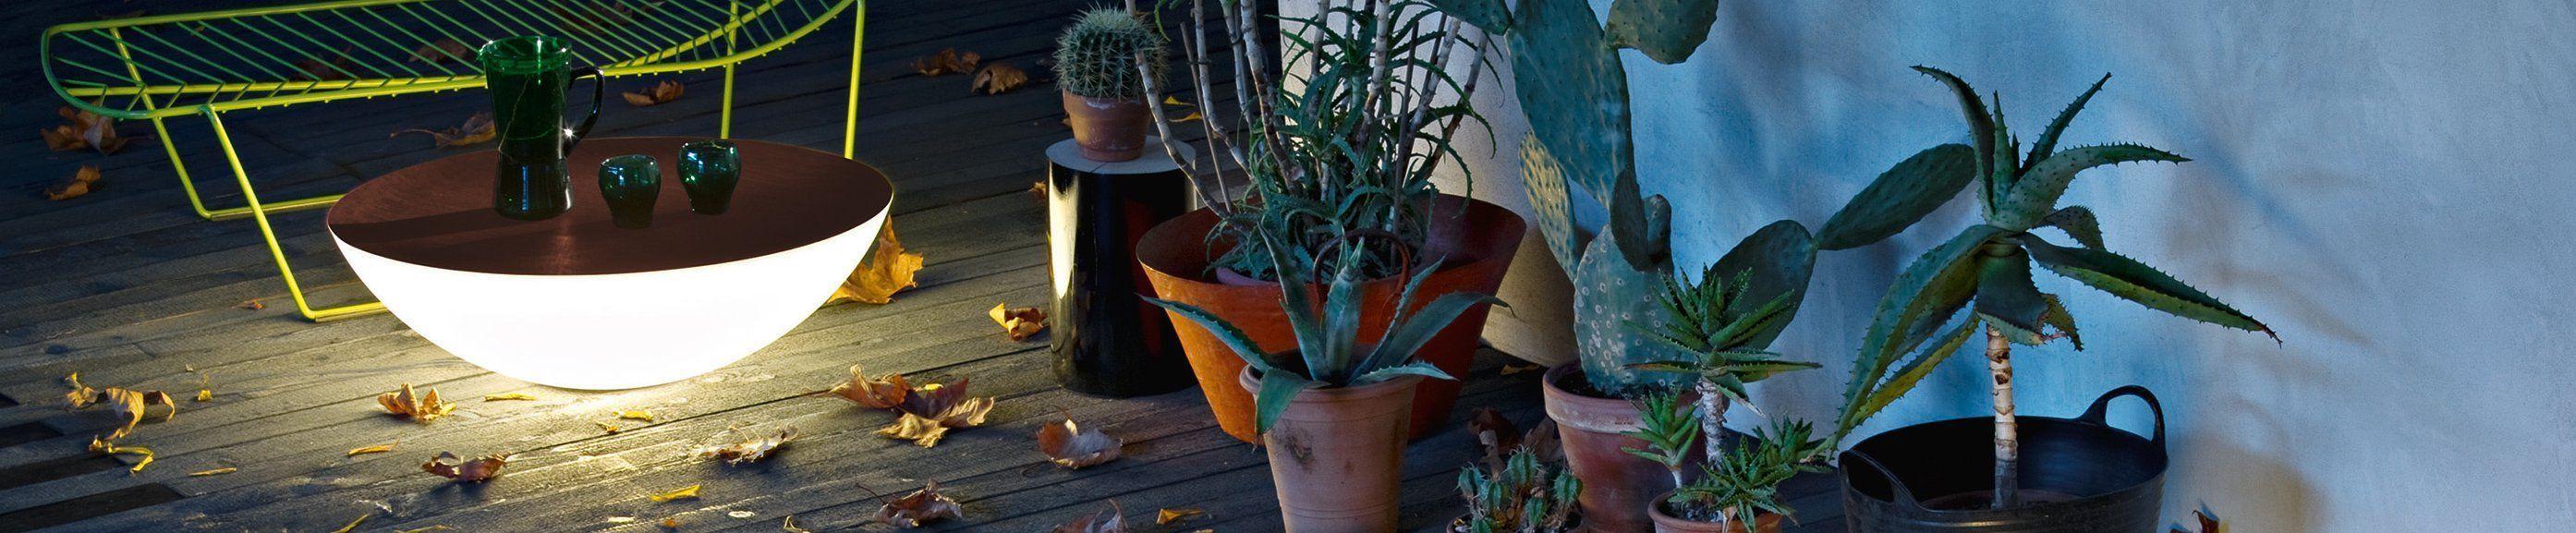 Gartentrend: Jardín Botánico